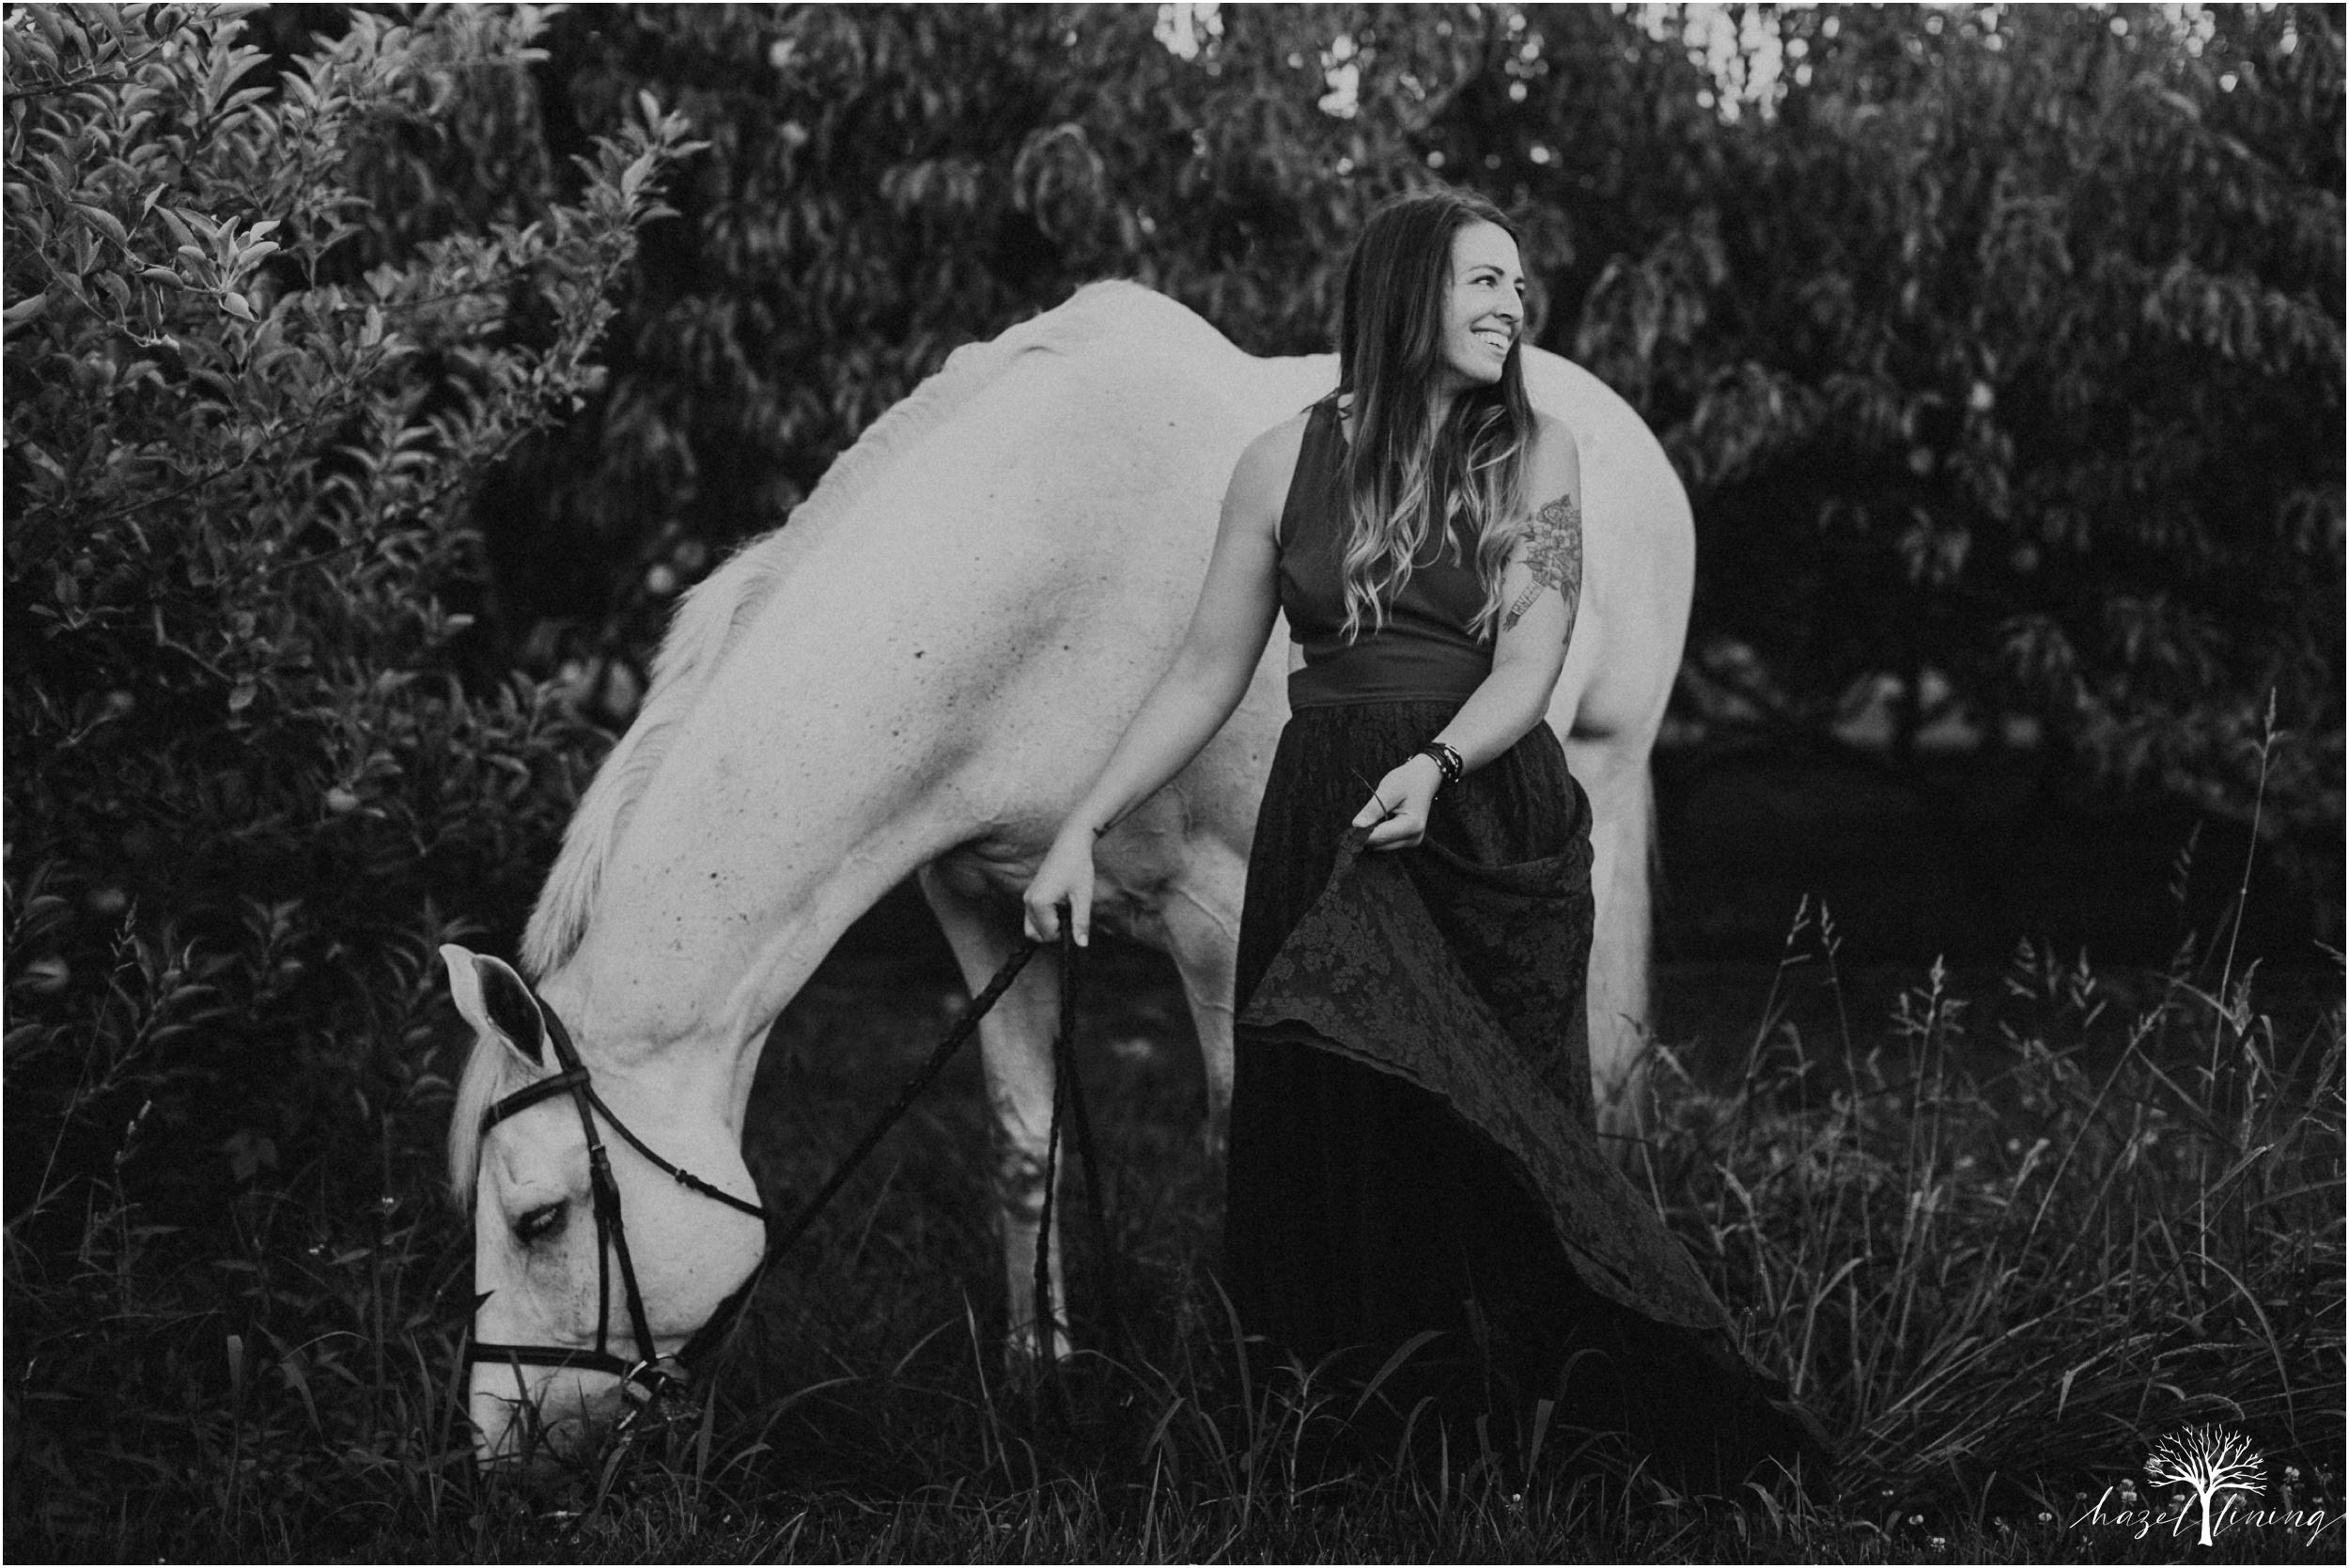 taylor-adams-and-horse-delaware-valley-university-delval-summer-equestrian-portrait-session-hazel-lining-photography-destination-elopement-wedding-engagement-photography_0044.jpg